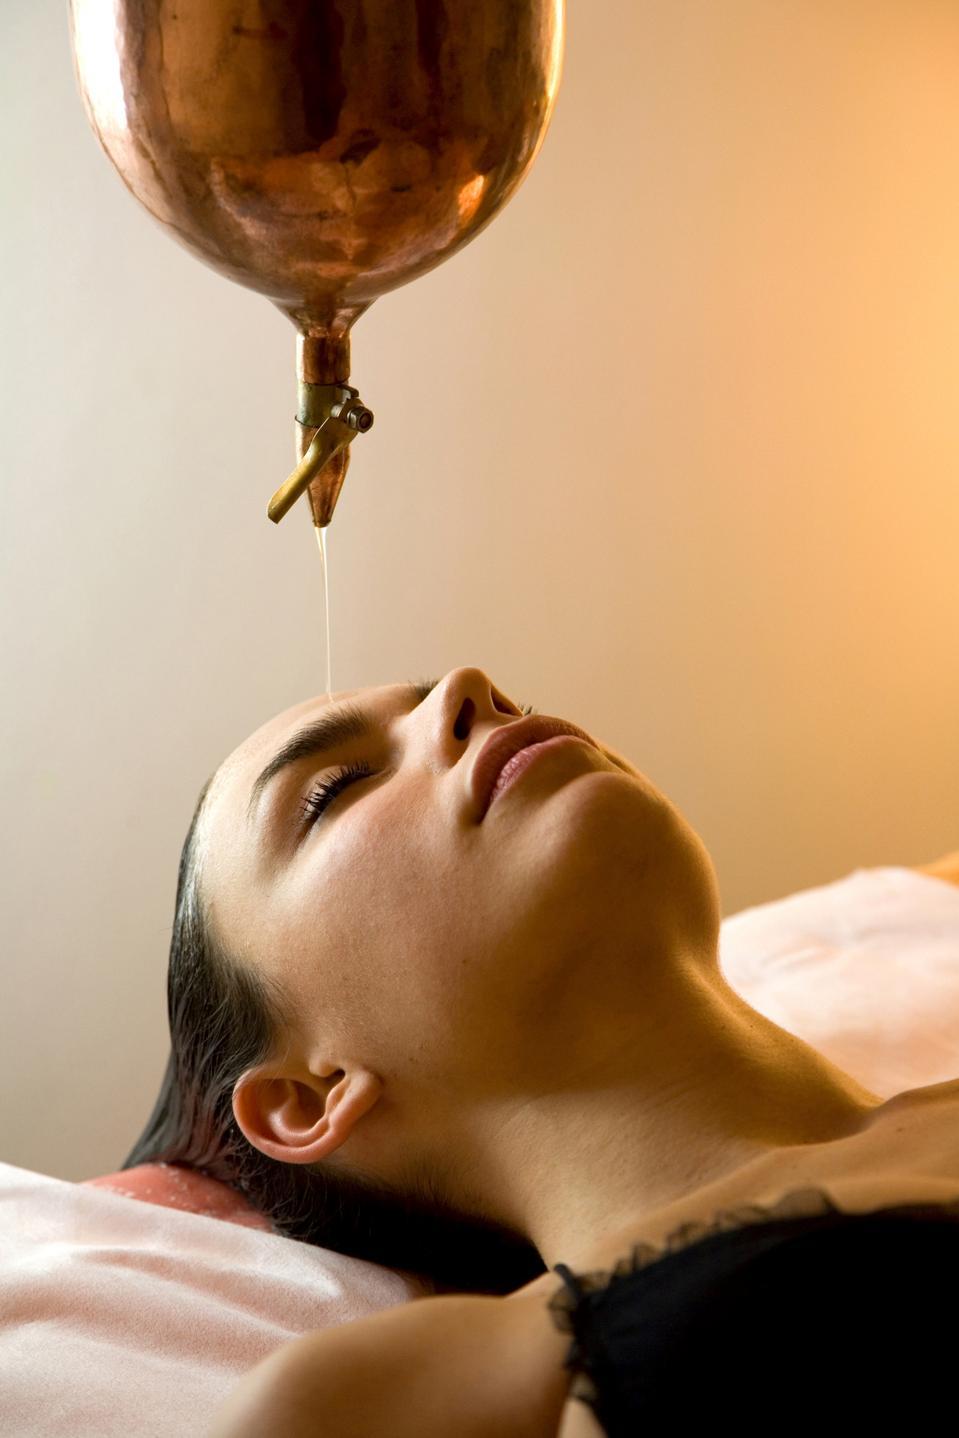 Woman Getting Ayurvedic Oil Treatment (shirodara)